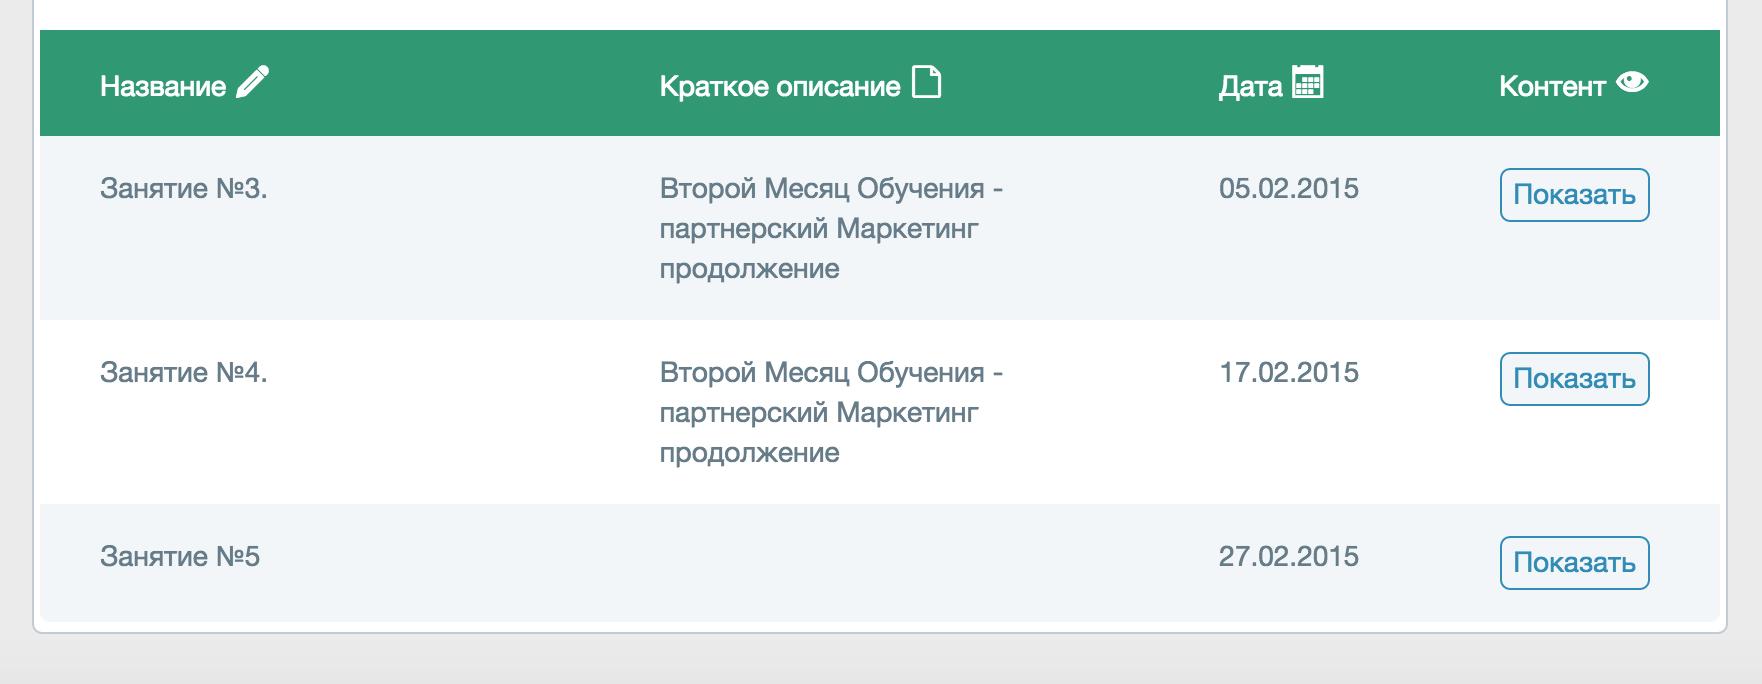 Снимок экрана 2015-03-05 в 12.48.42